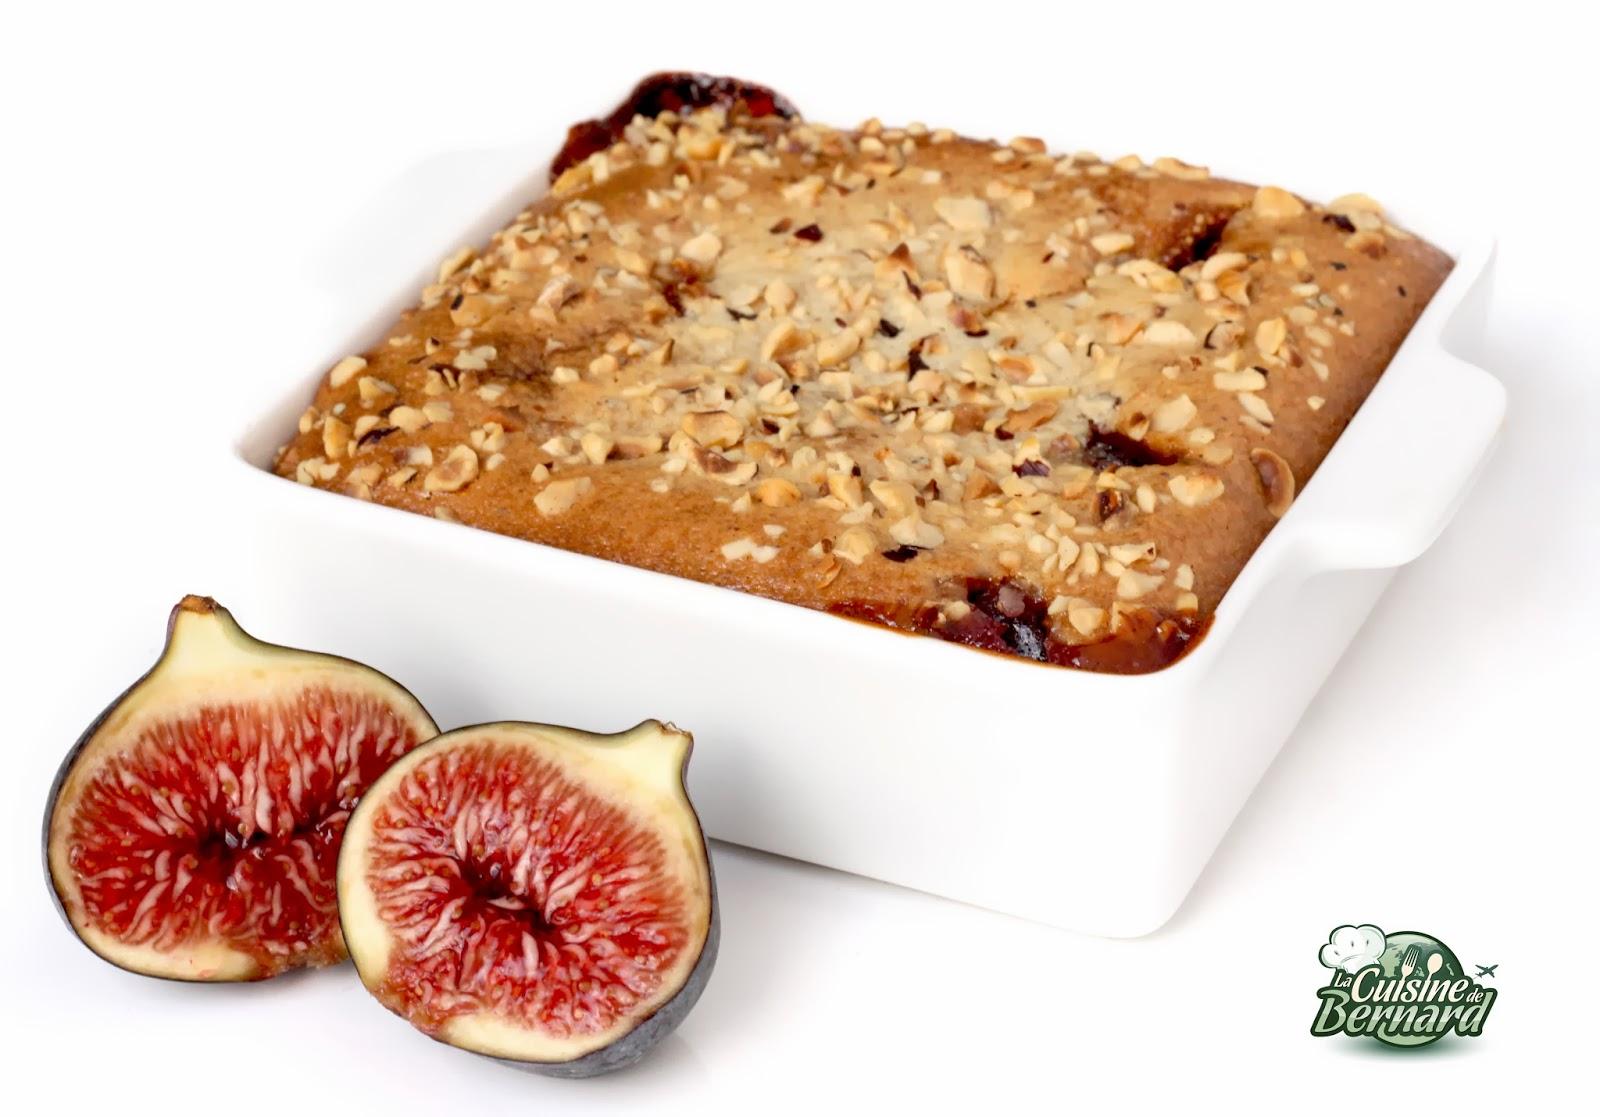 La cuisine de bernard g teau fondant figues amandes et - La cuisine de bernard fondant ...